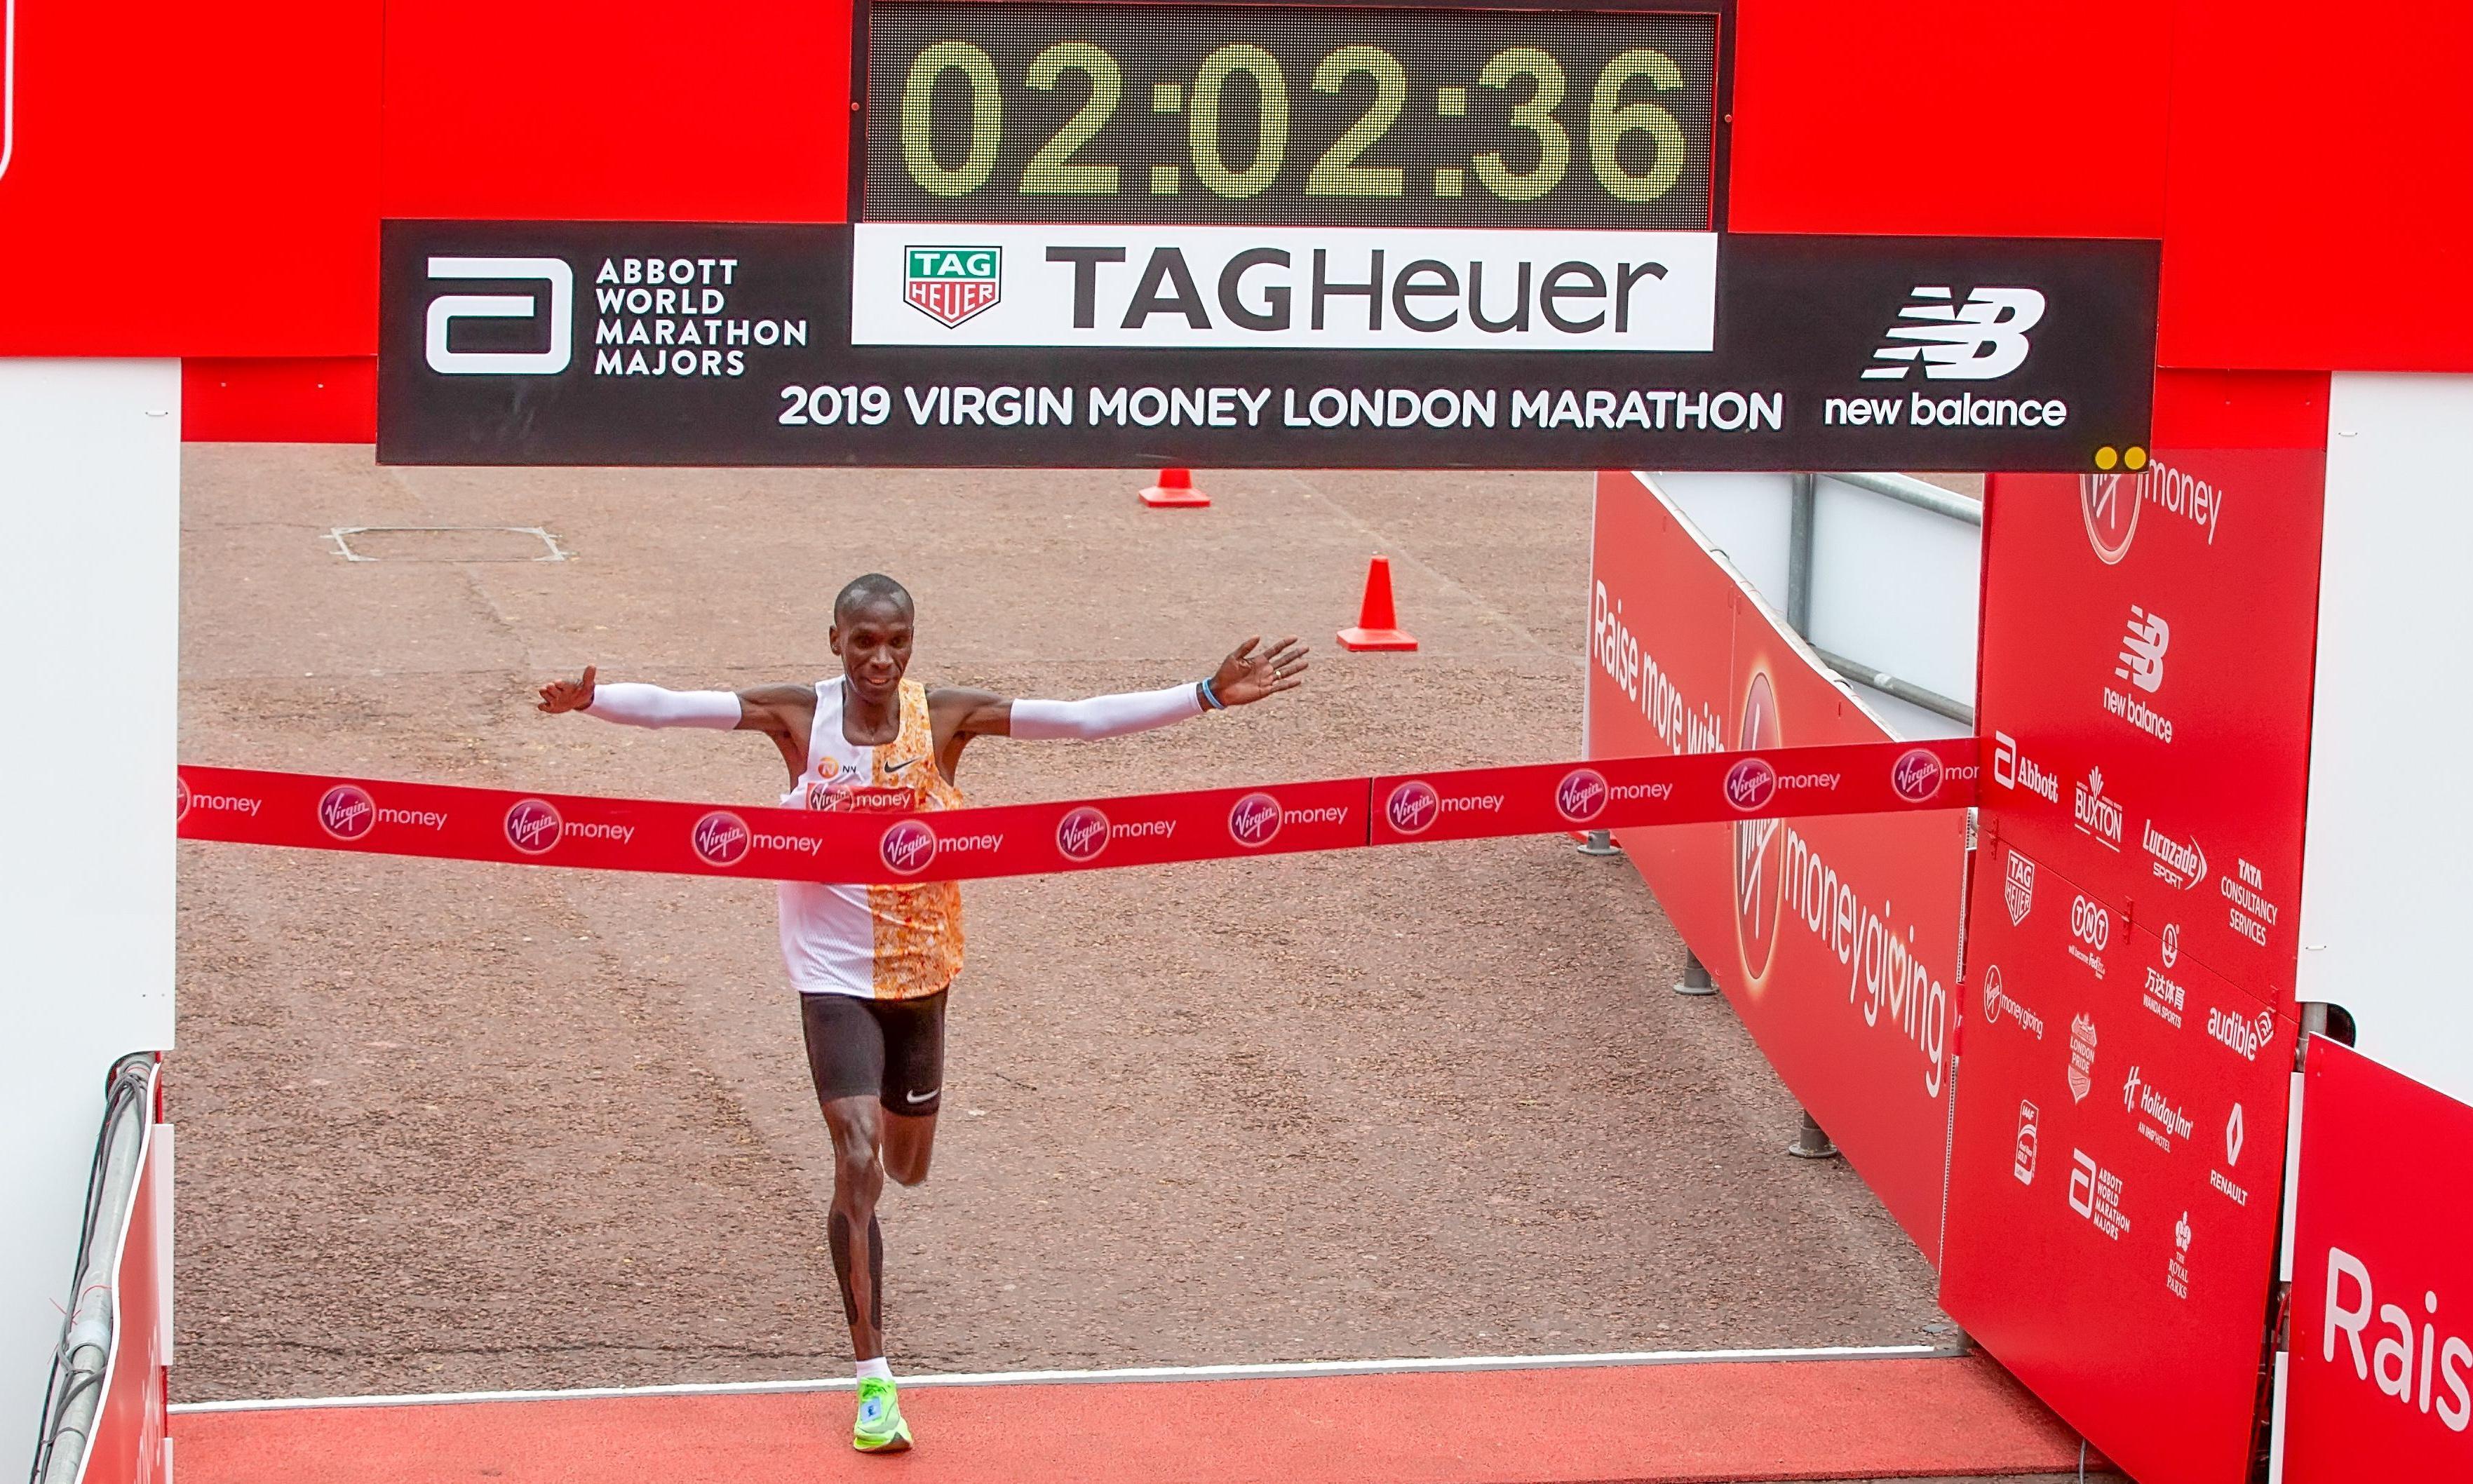 Eliud Kipchoge can break world marathon record again, predicts coach